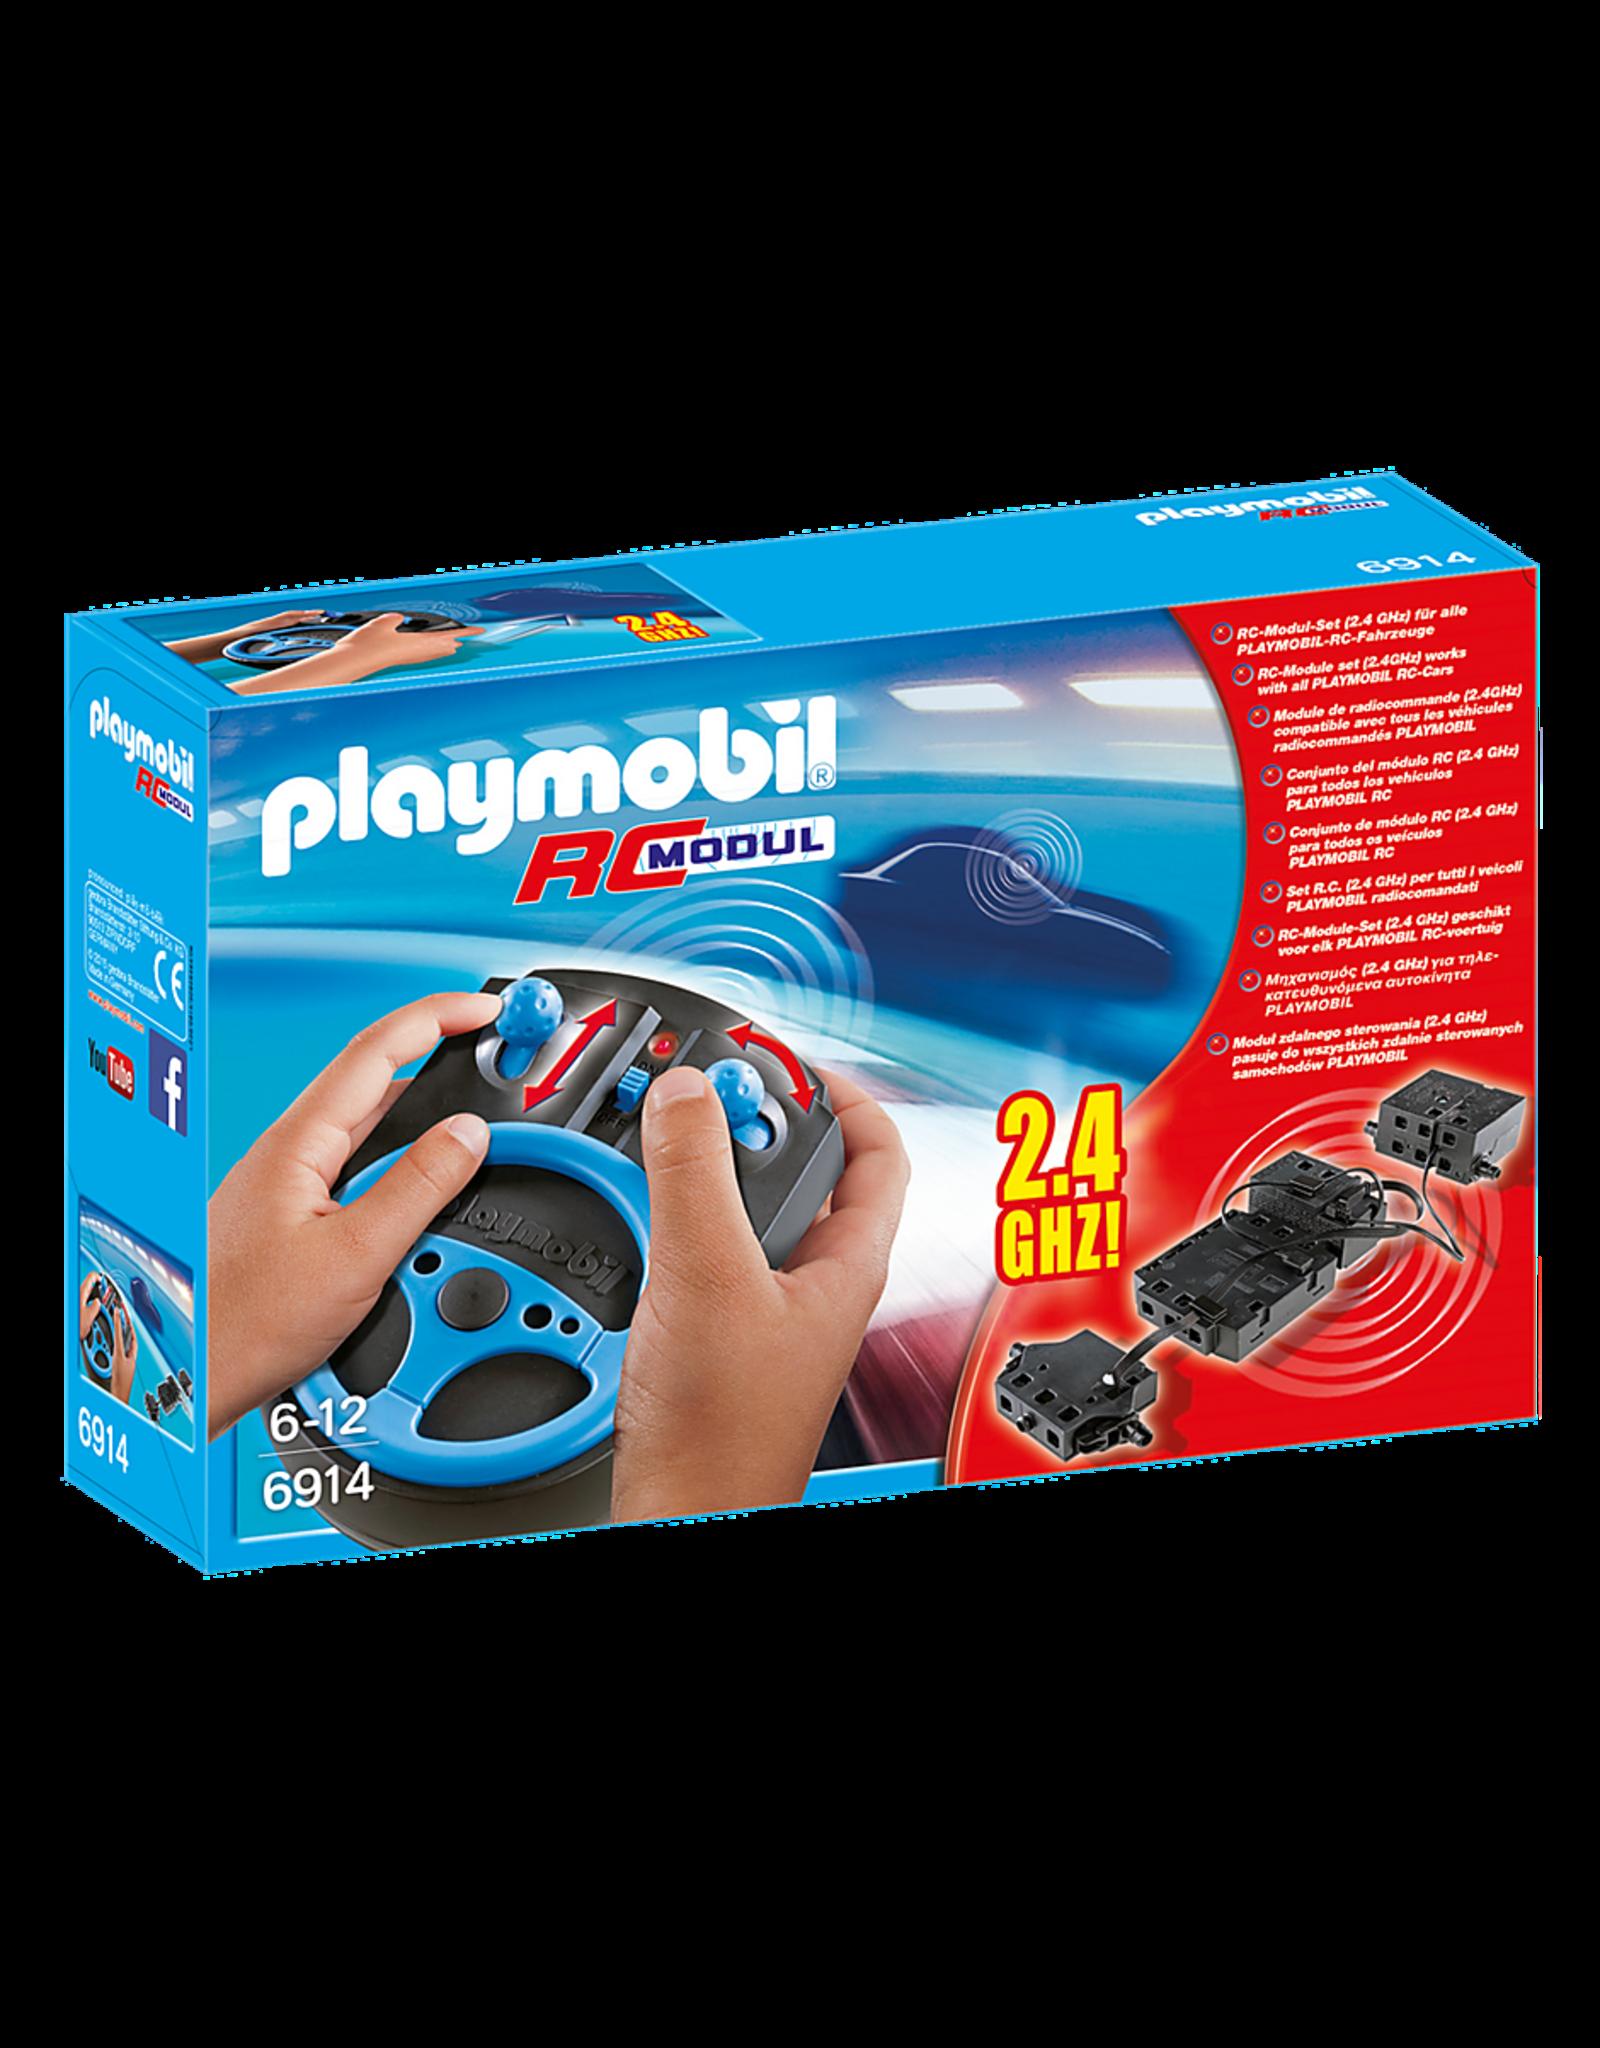 Playmobil Remote Control Set 2.4GHz